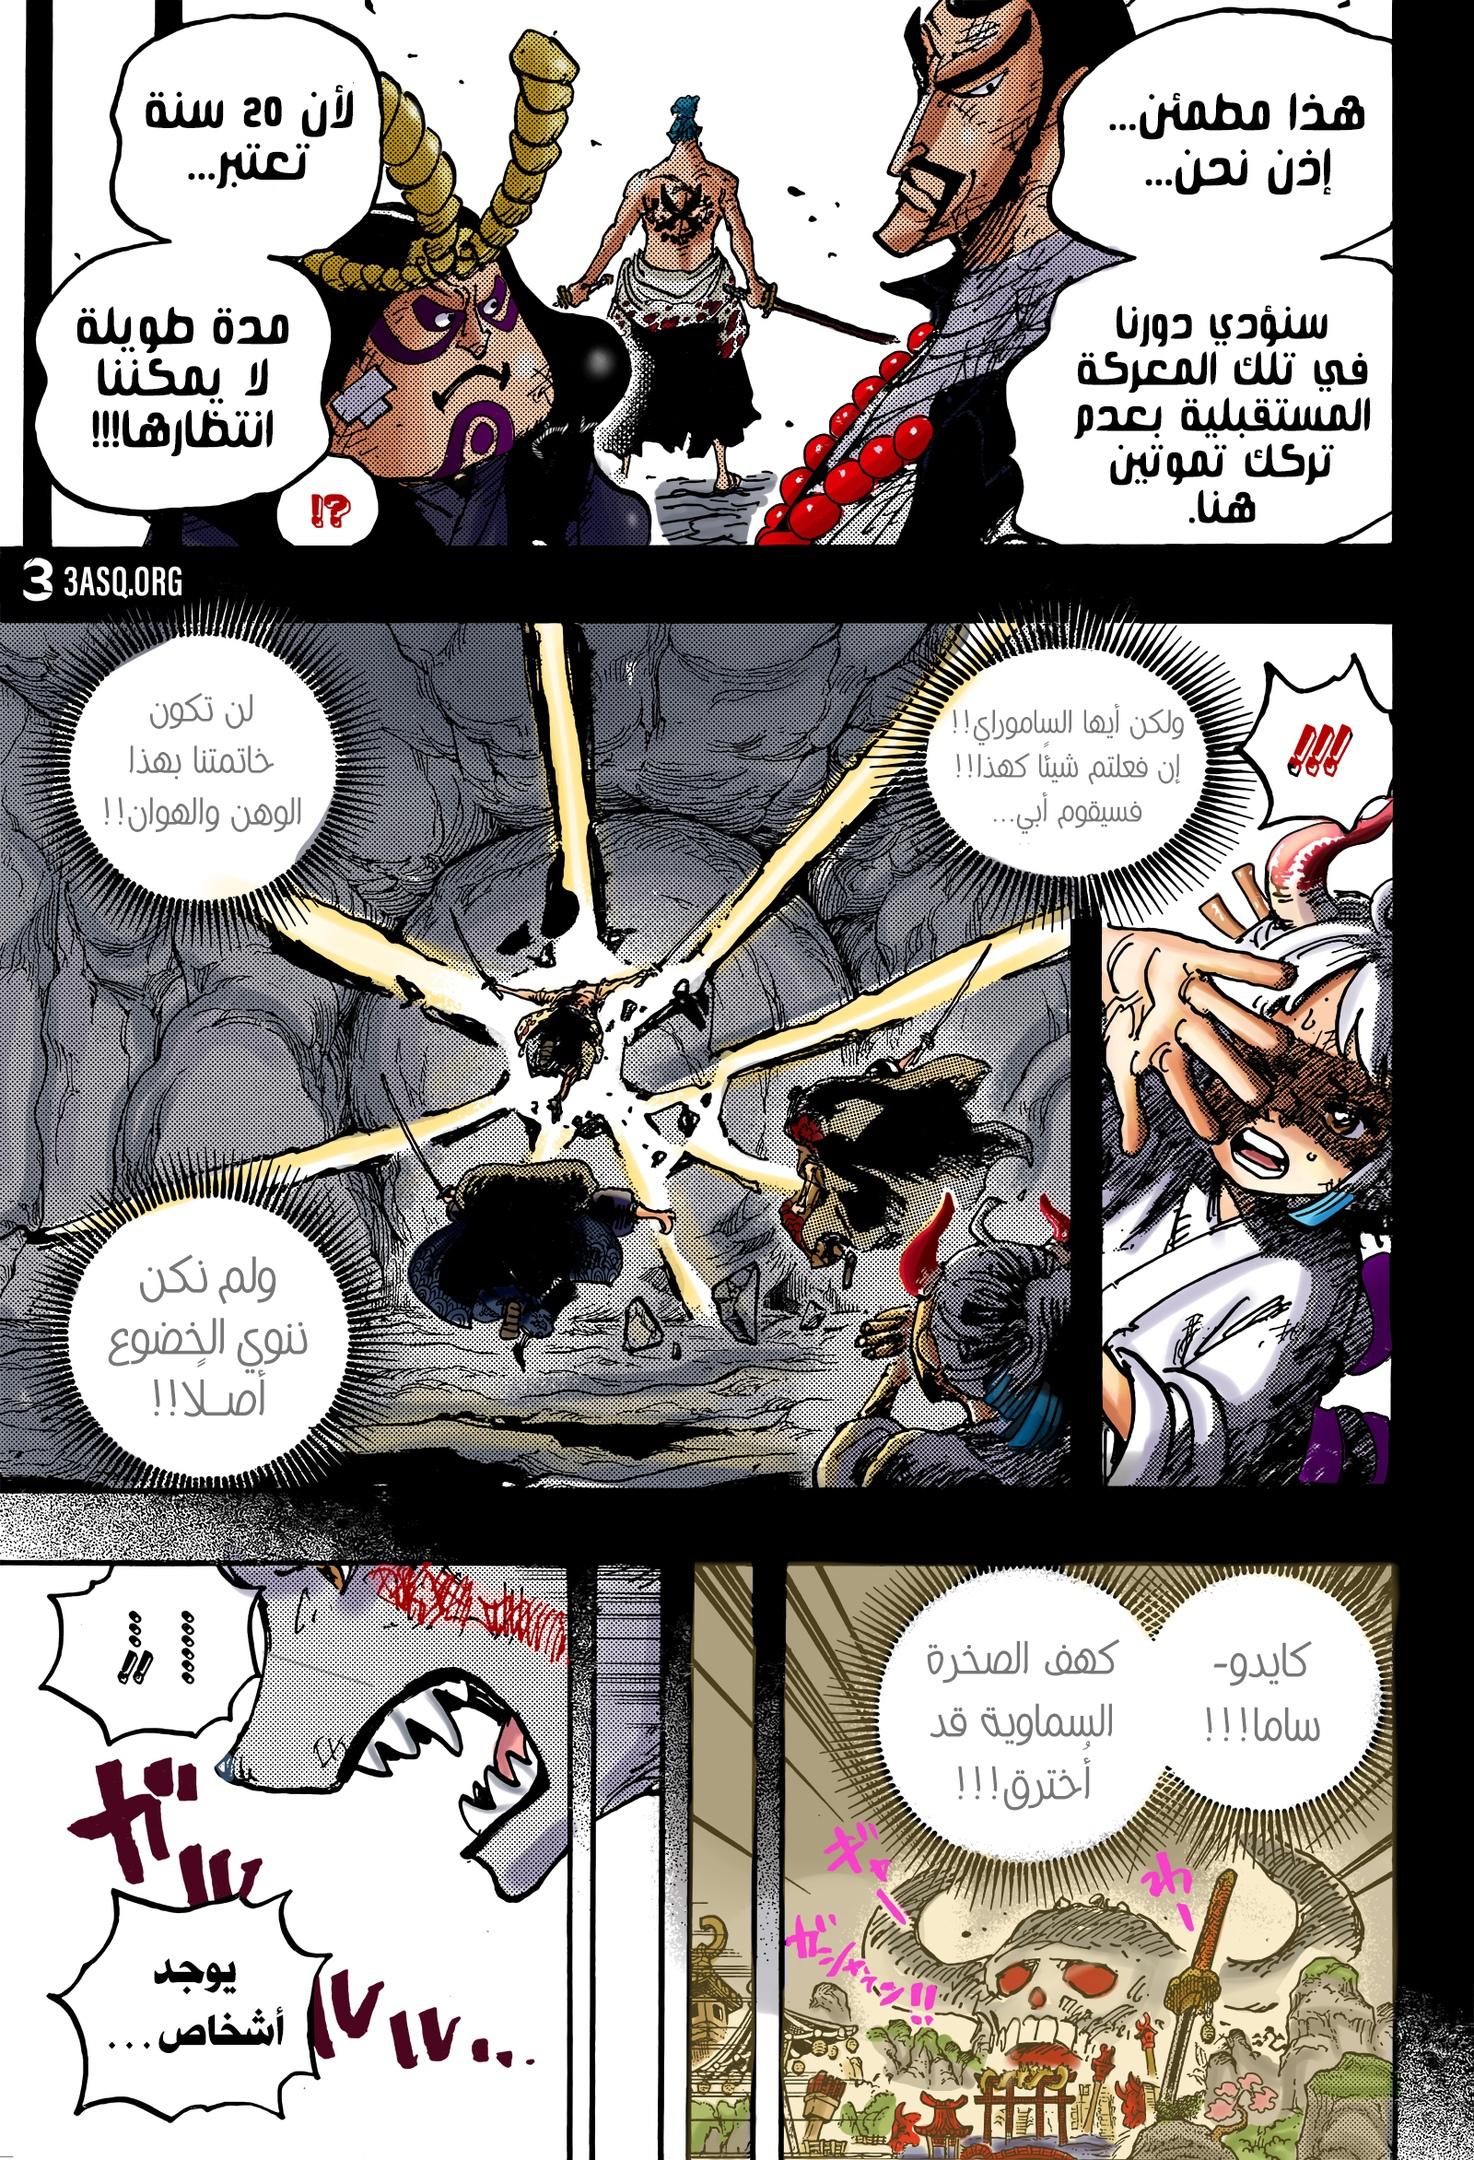 One Piece Arab 1024, image №23